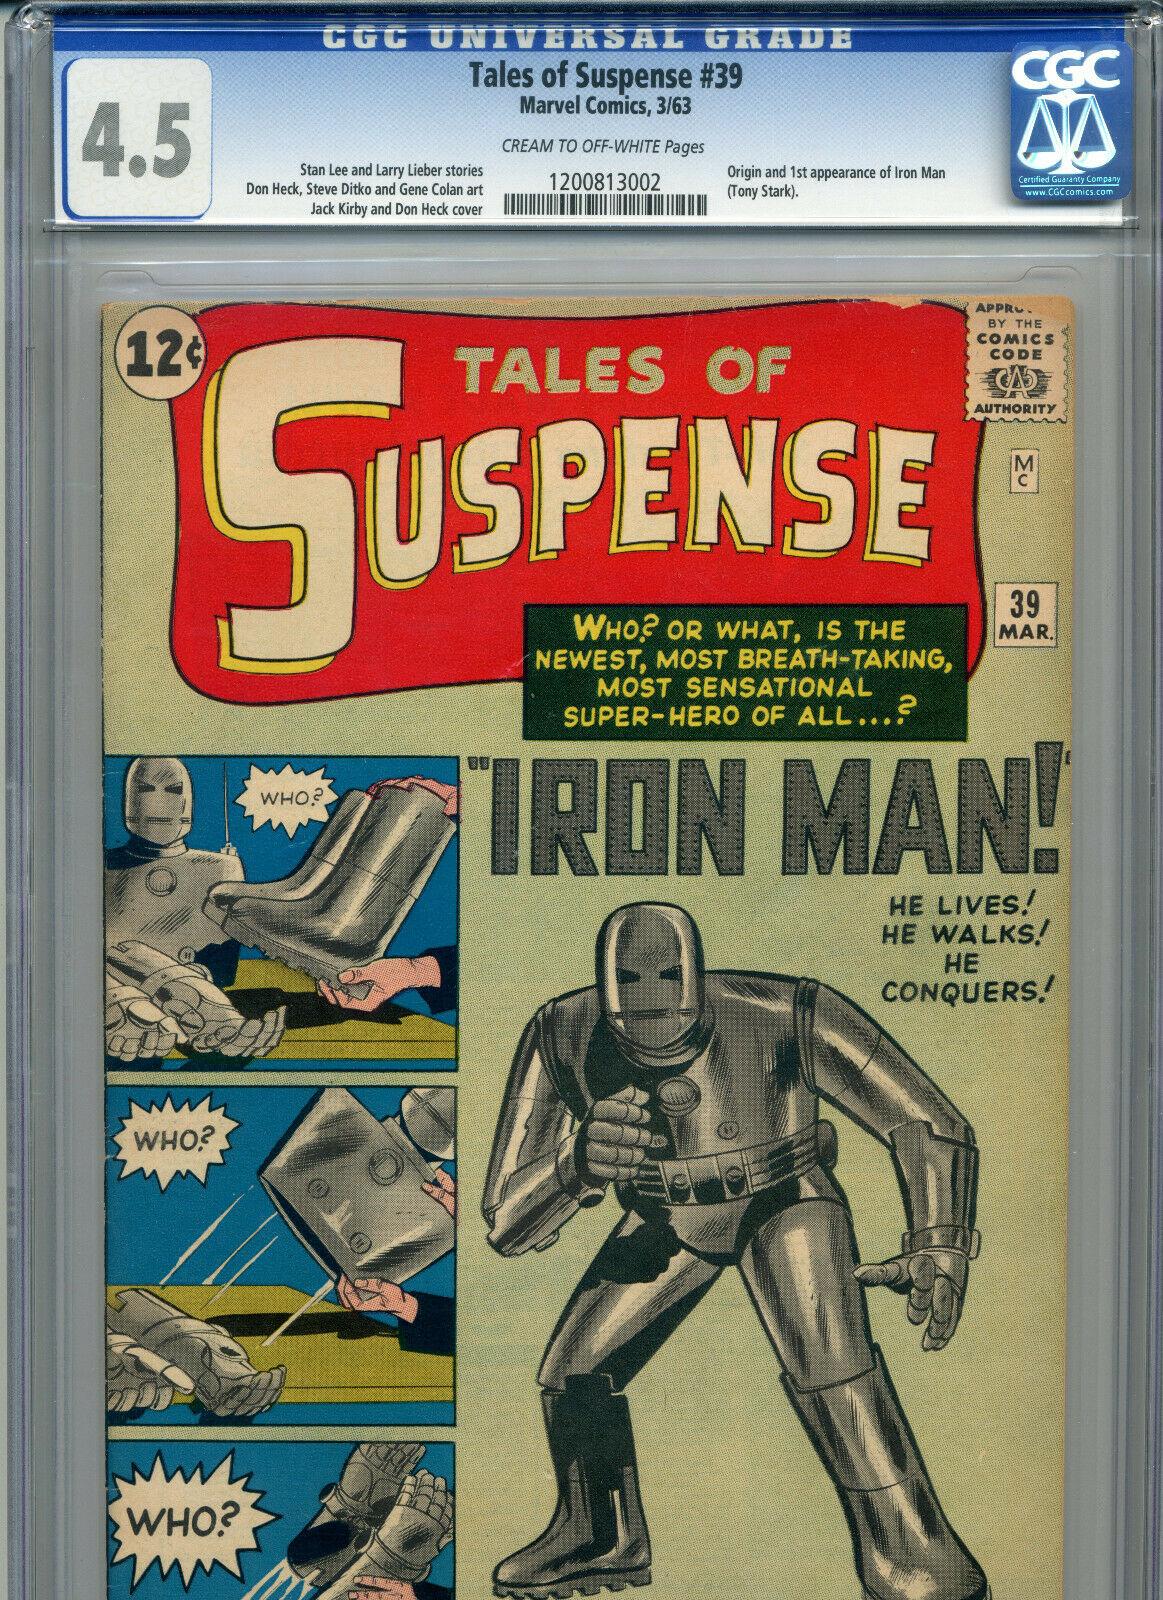 TALES OF SUSPENSE #39 CGC GRADED 4.5 (1963 MARVEL) 1ST TONY STARK IRON MAN